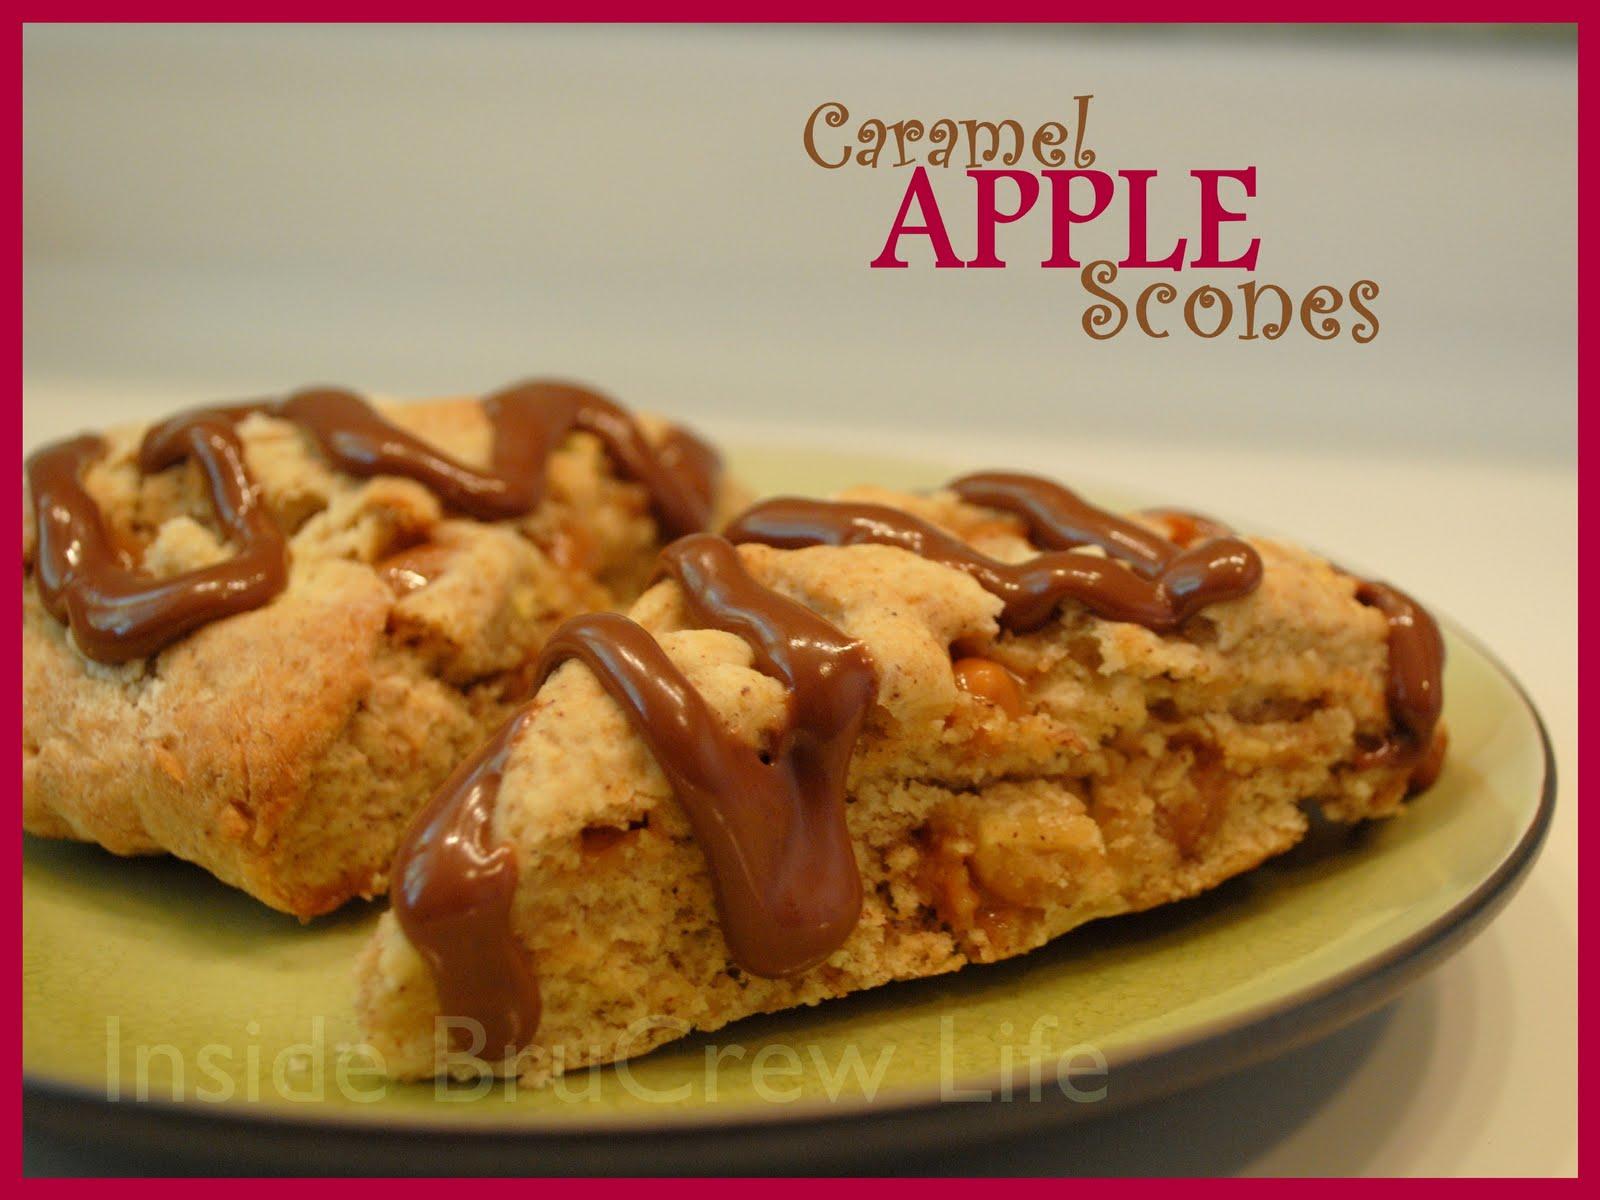 caramel apple pie caramel apple pie caramel apple pie caramel apple ...